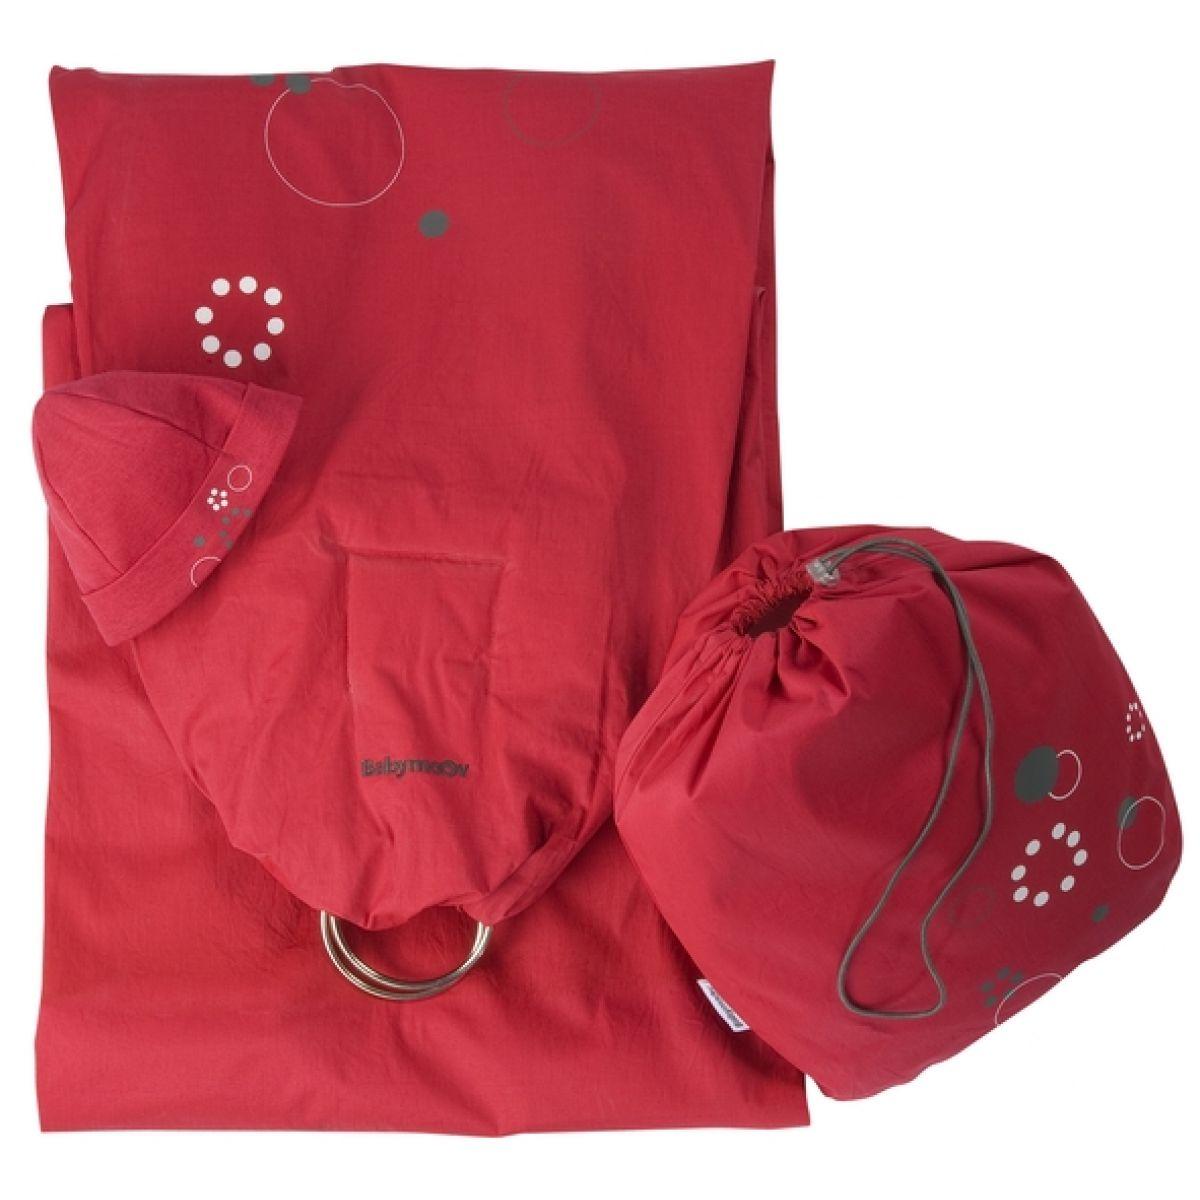 Baby šátek RING RED/GREY Babymoov 057203